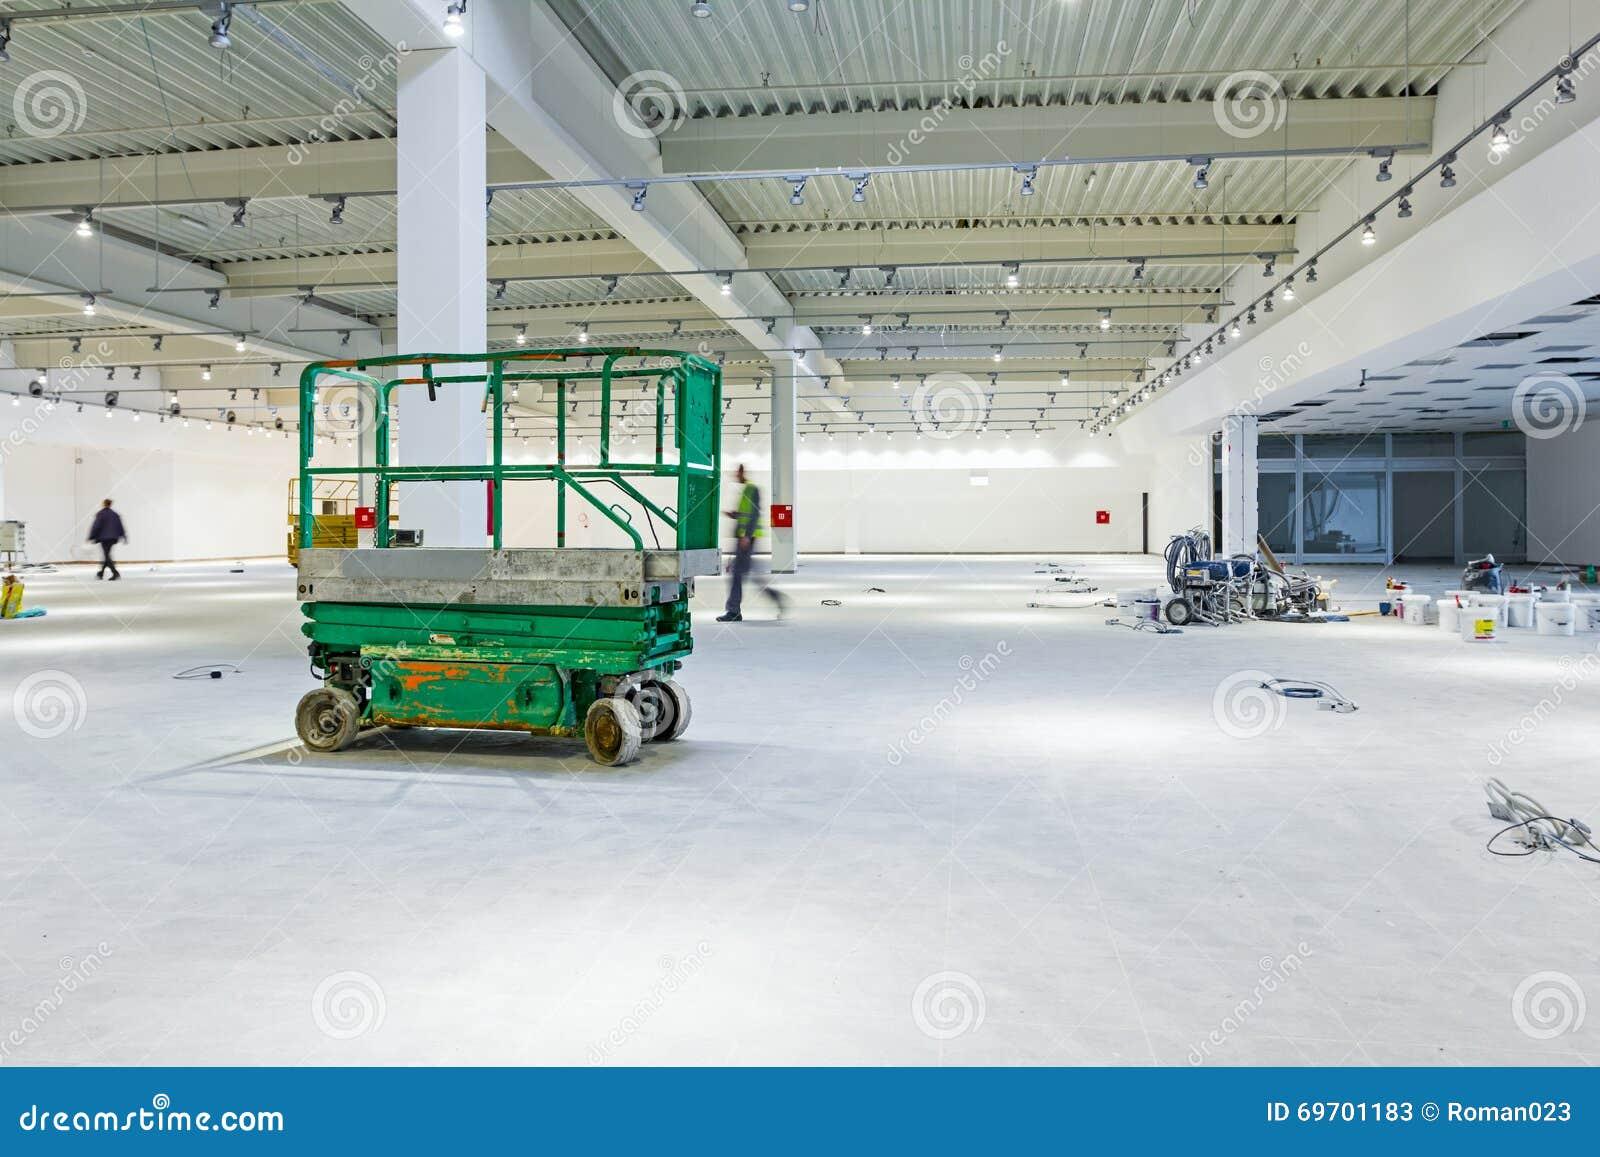 Scissor Lift Platform On A Construction Site  Stock Image - Image of